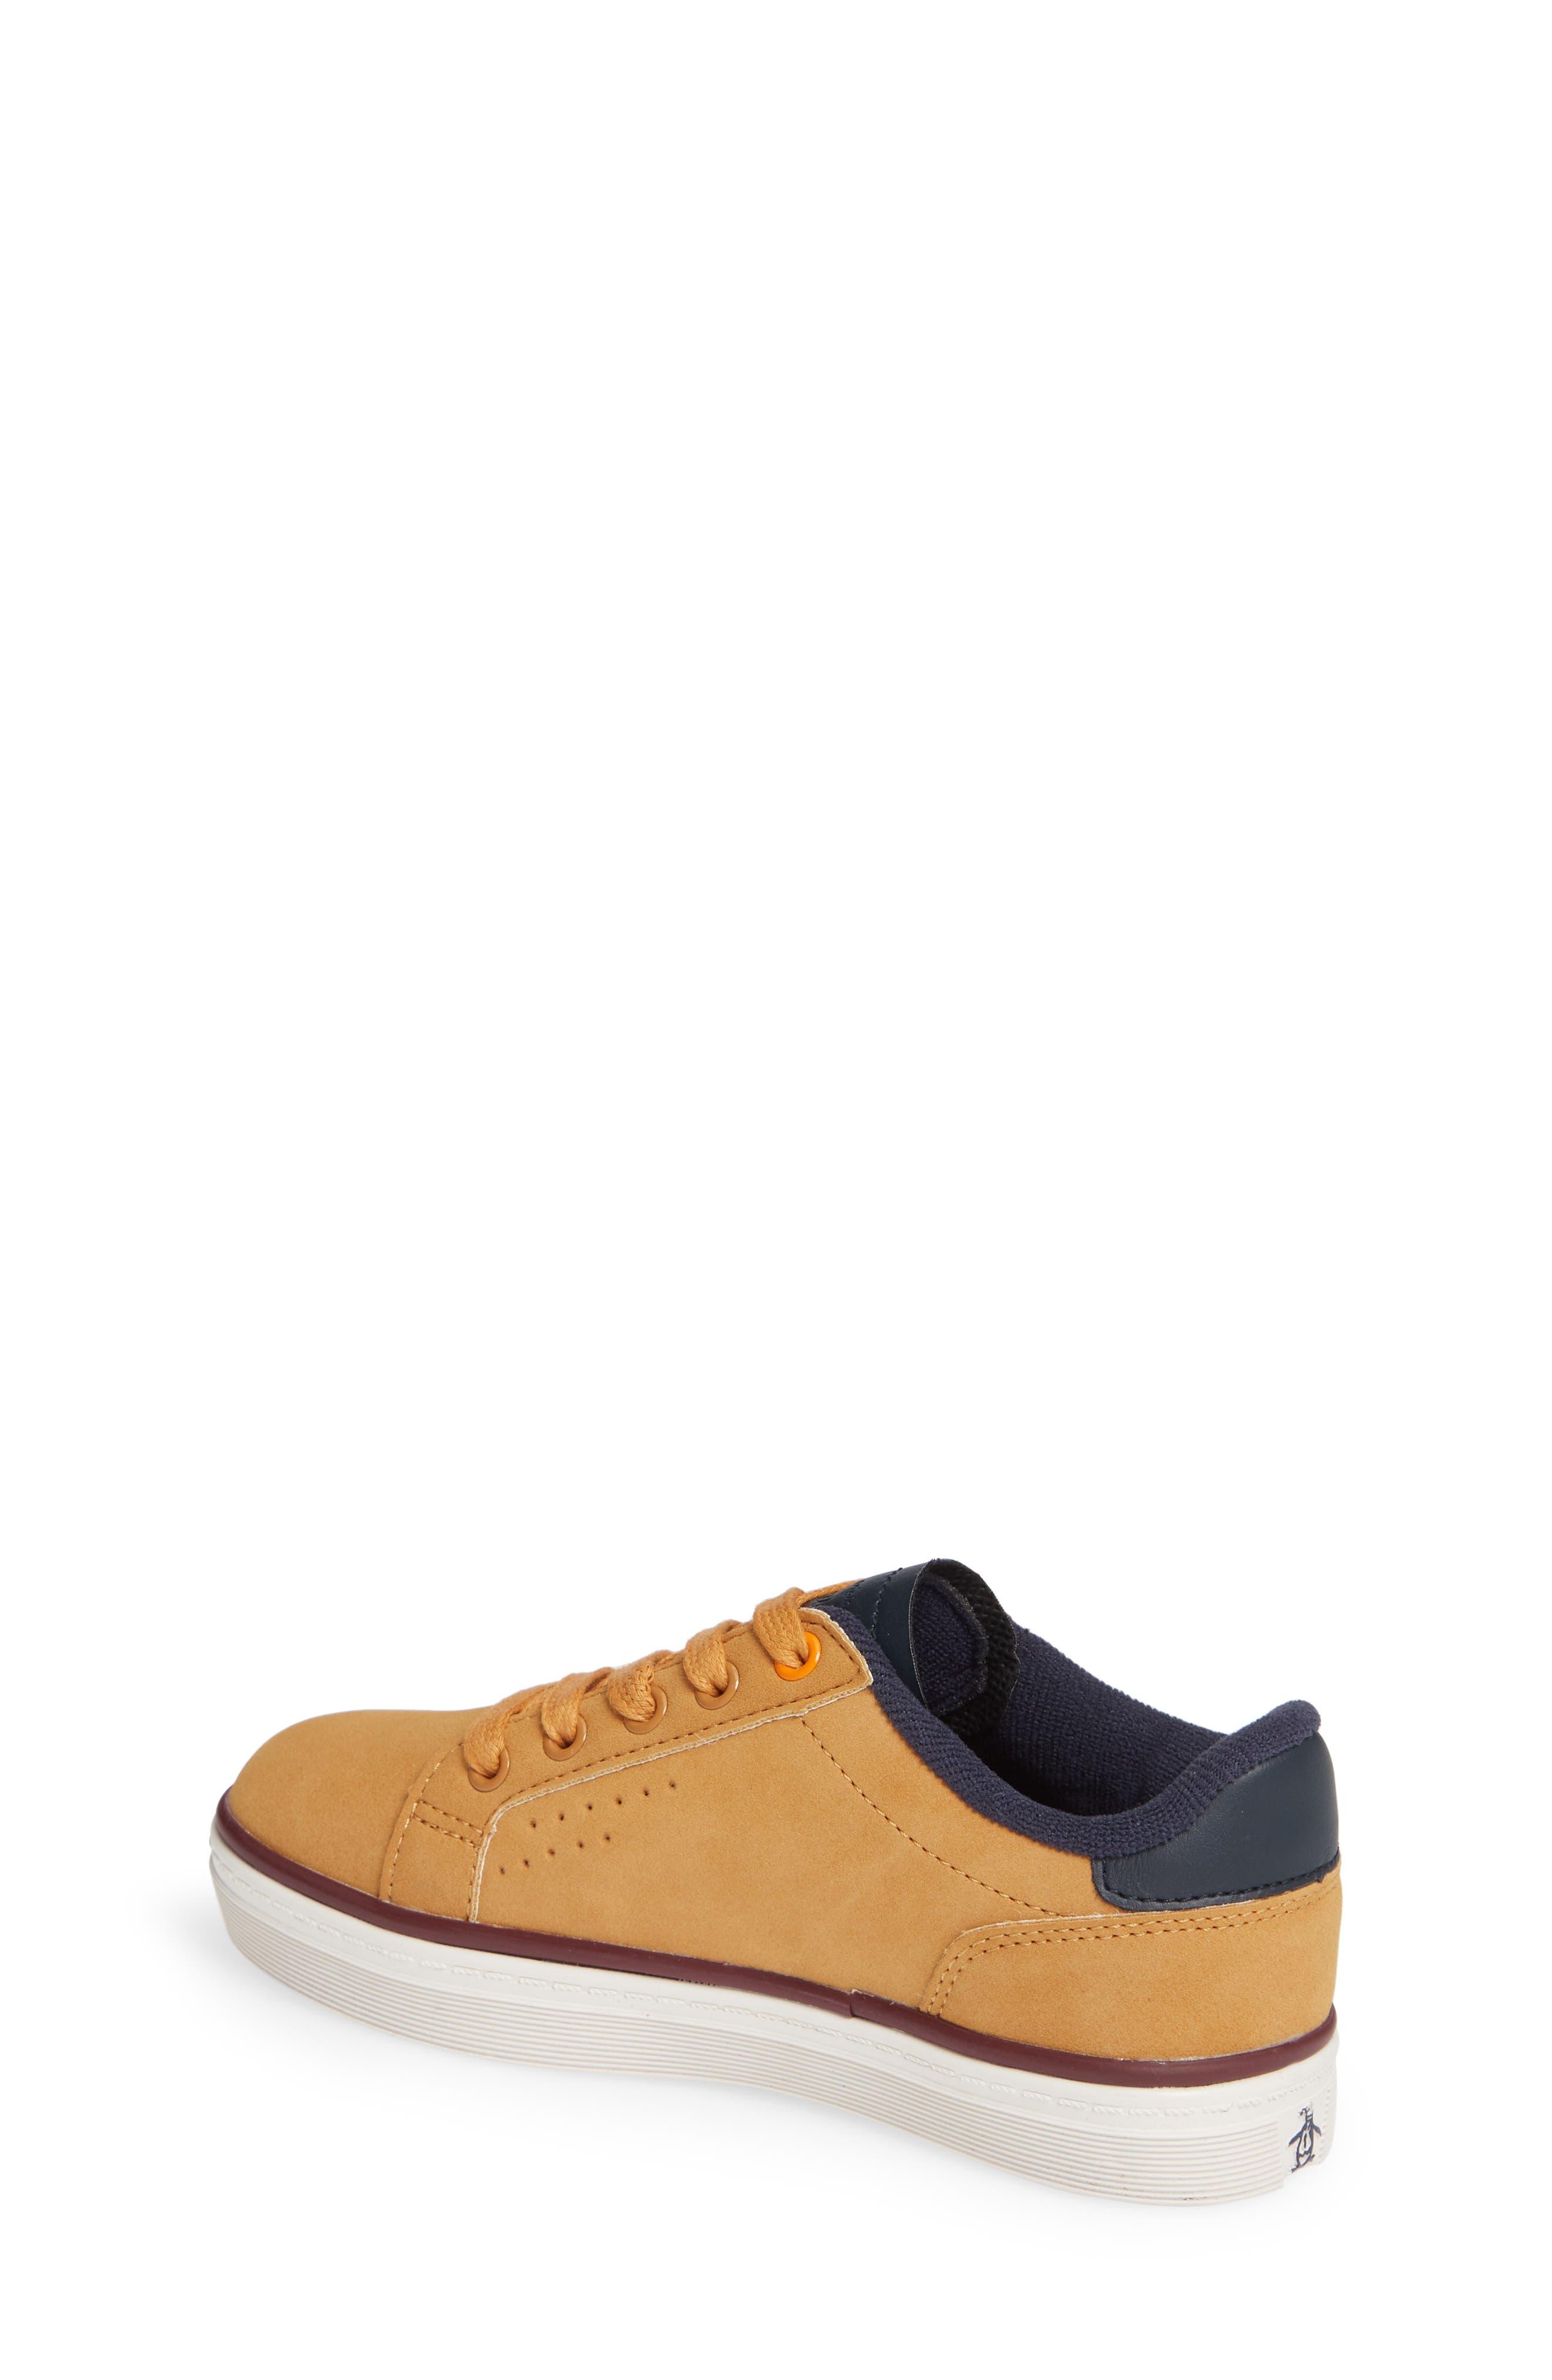 ORIGINAL PENGUIN,                             Dexter Sneaker,                             Alternate thumbnail 2, color,                             WHEAT/ NAVY